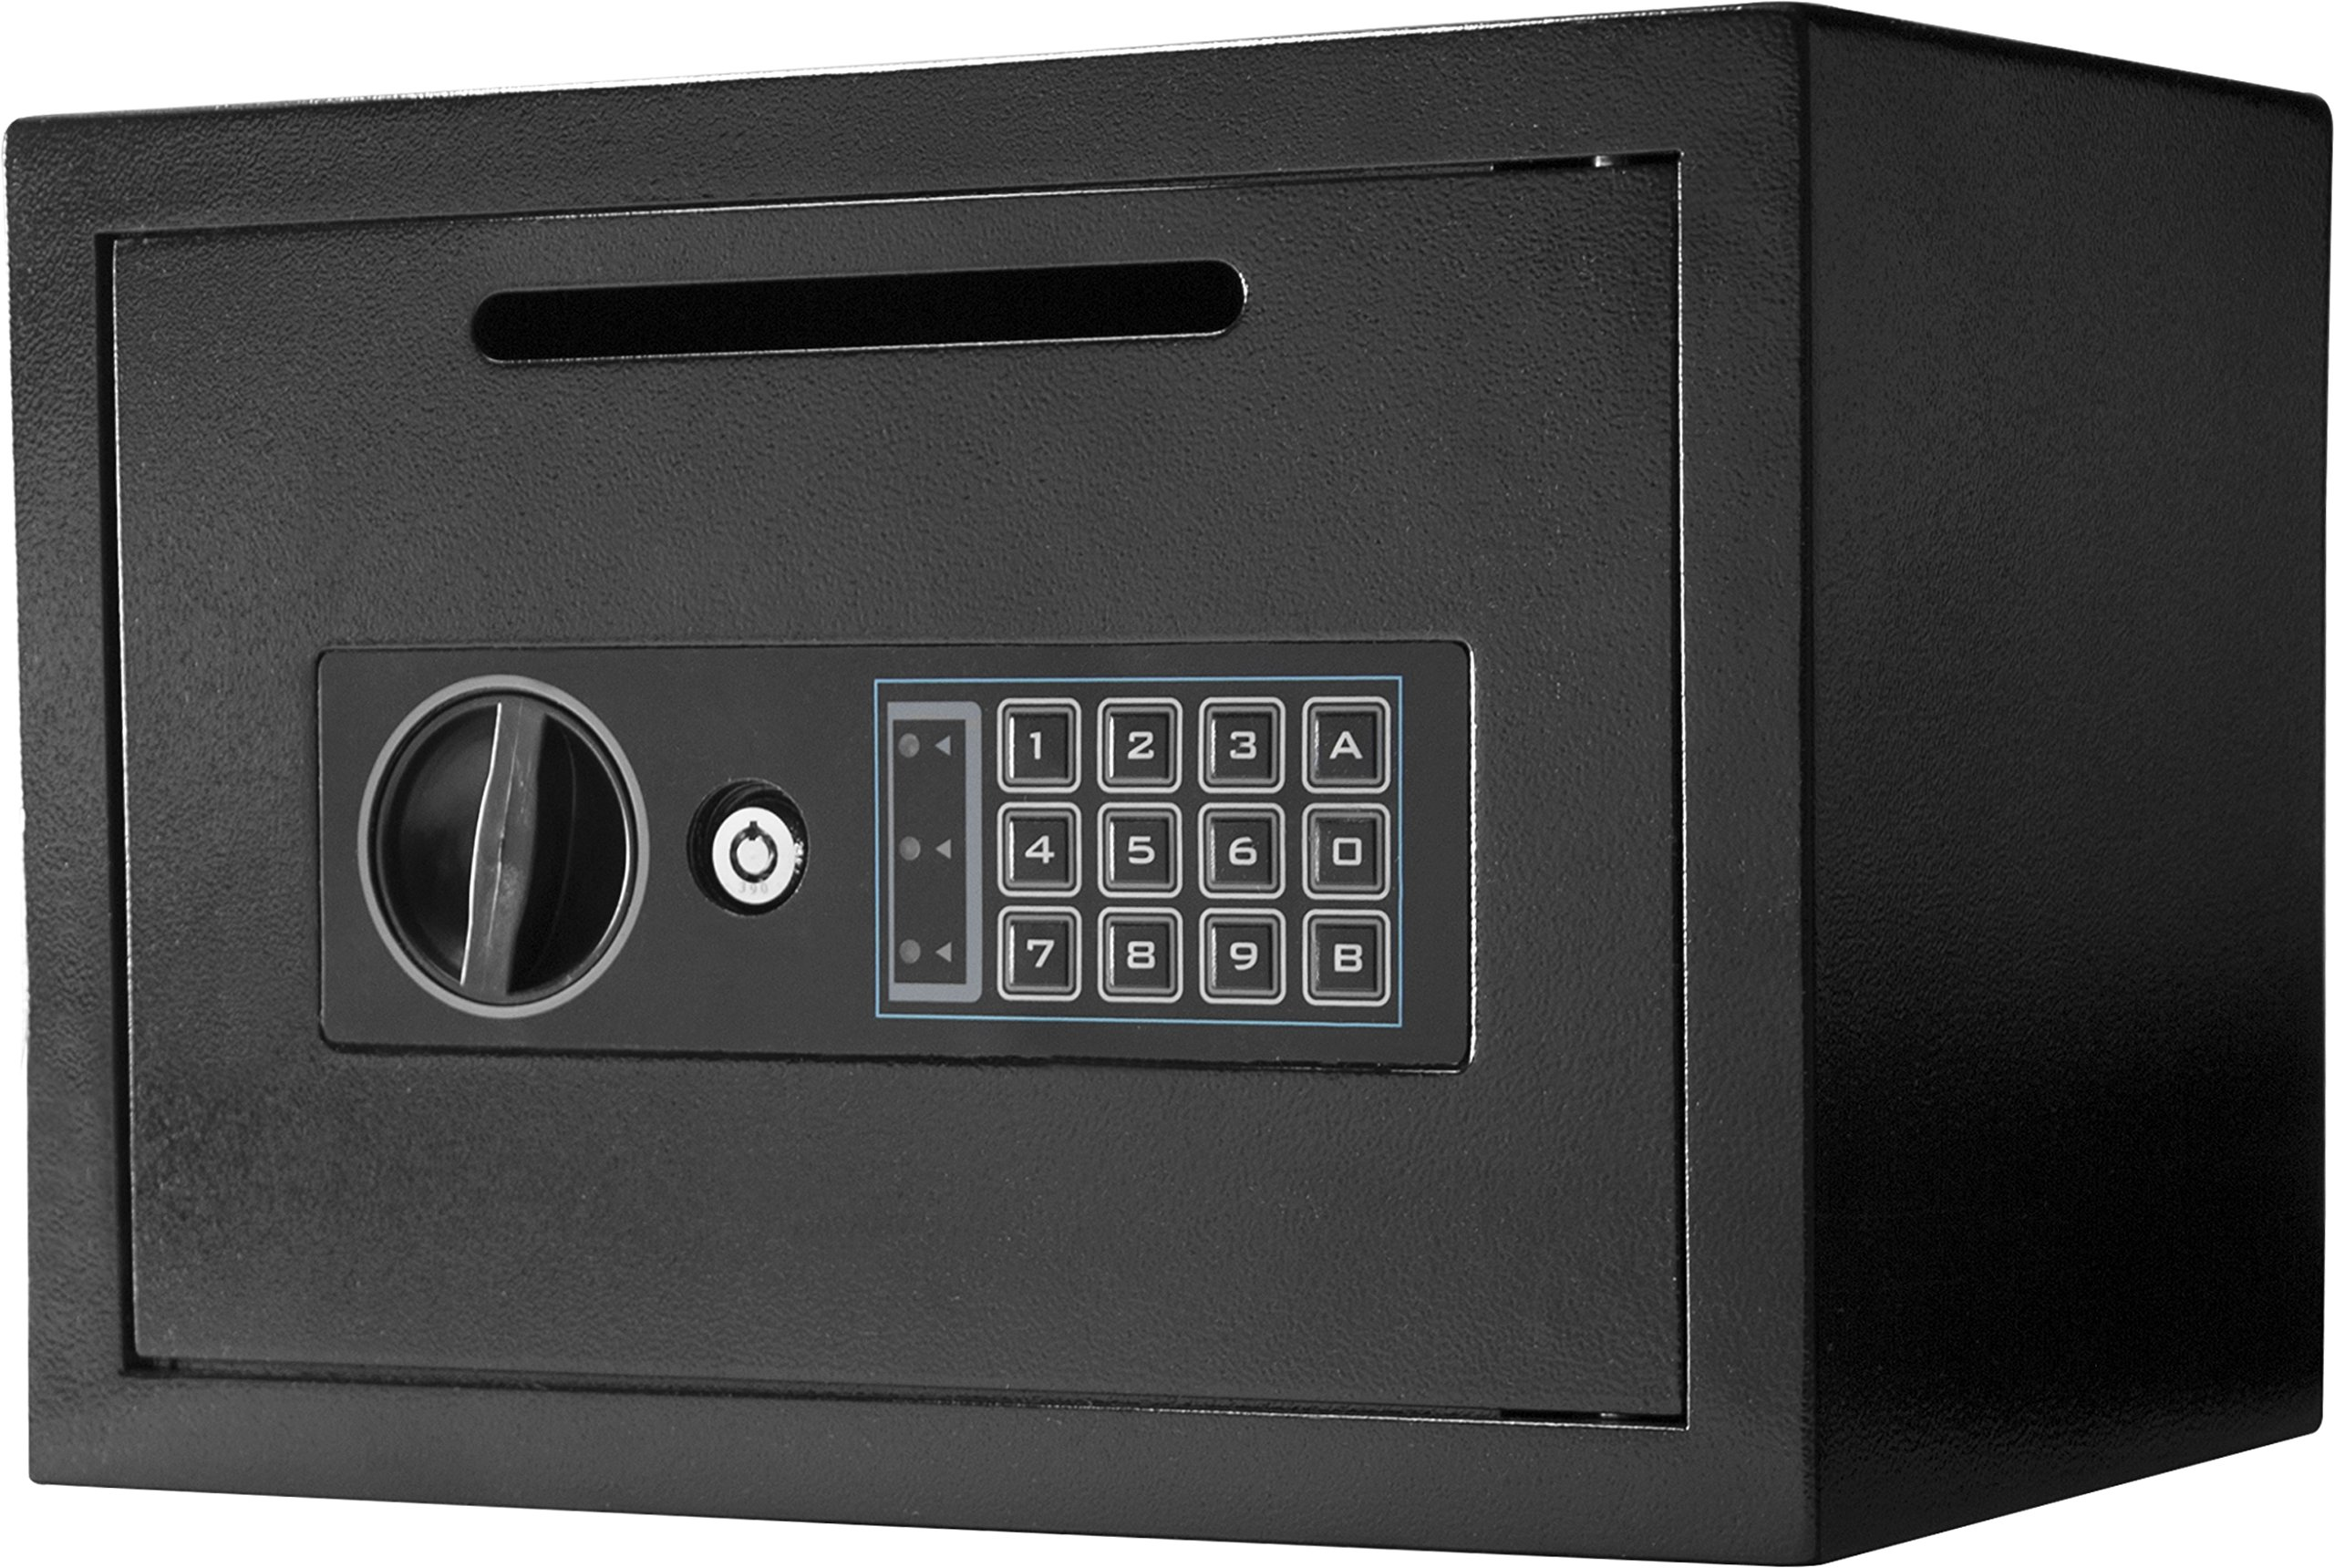 Winbest Steel Digital Keypad Depository Mail Money Cash Drop Deposit Safe Box by winbest